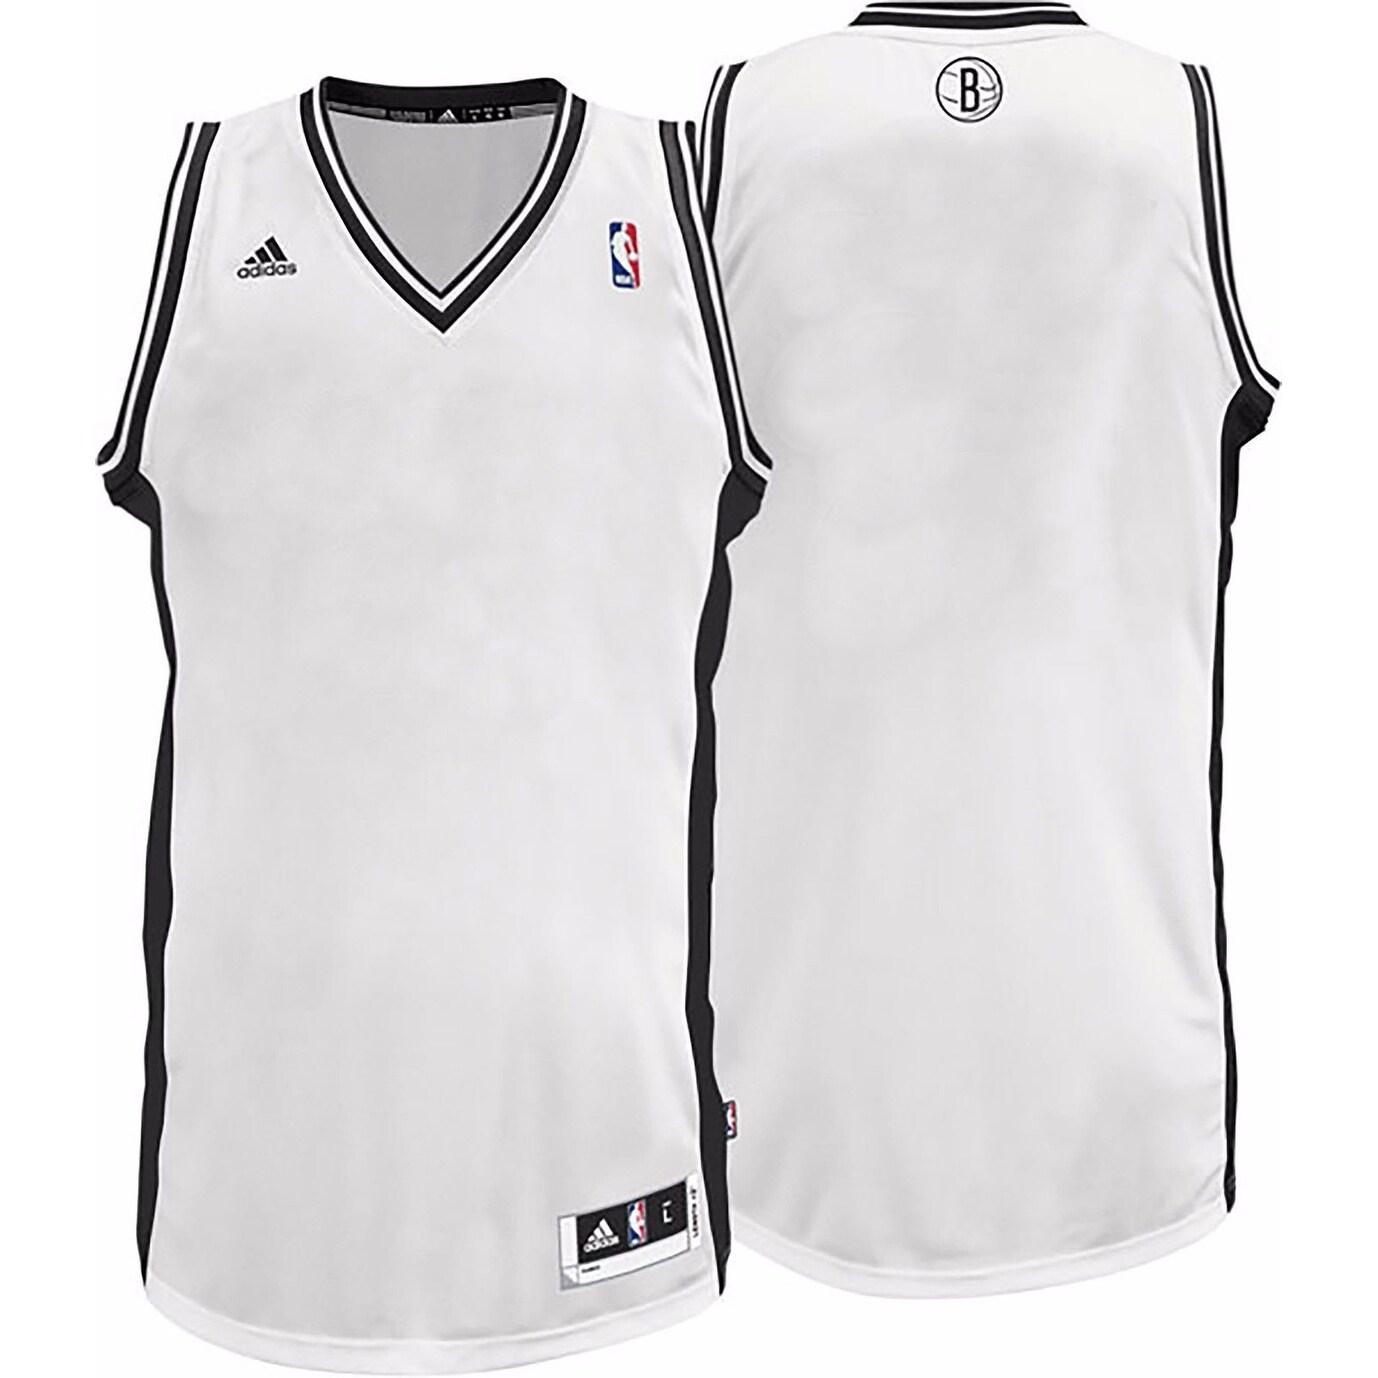 Brooklyn Nets NBA Men's Adidas White Blank Jersey